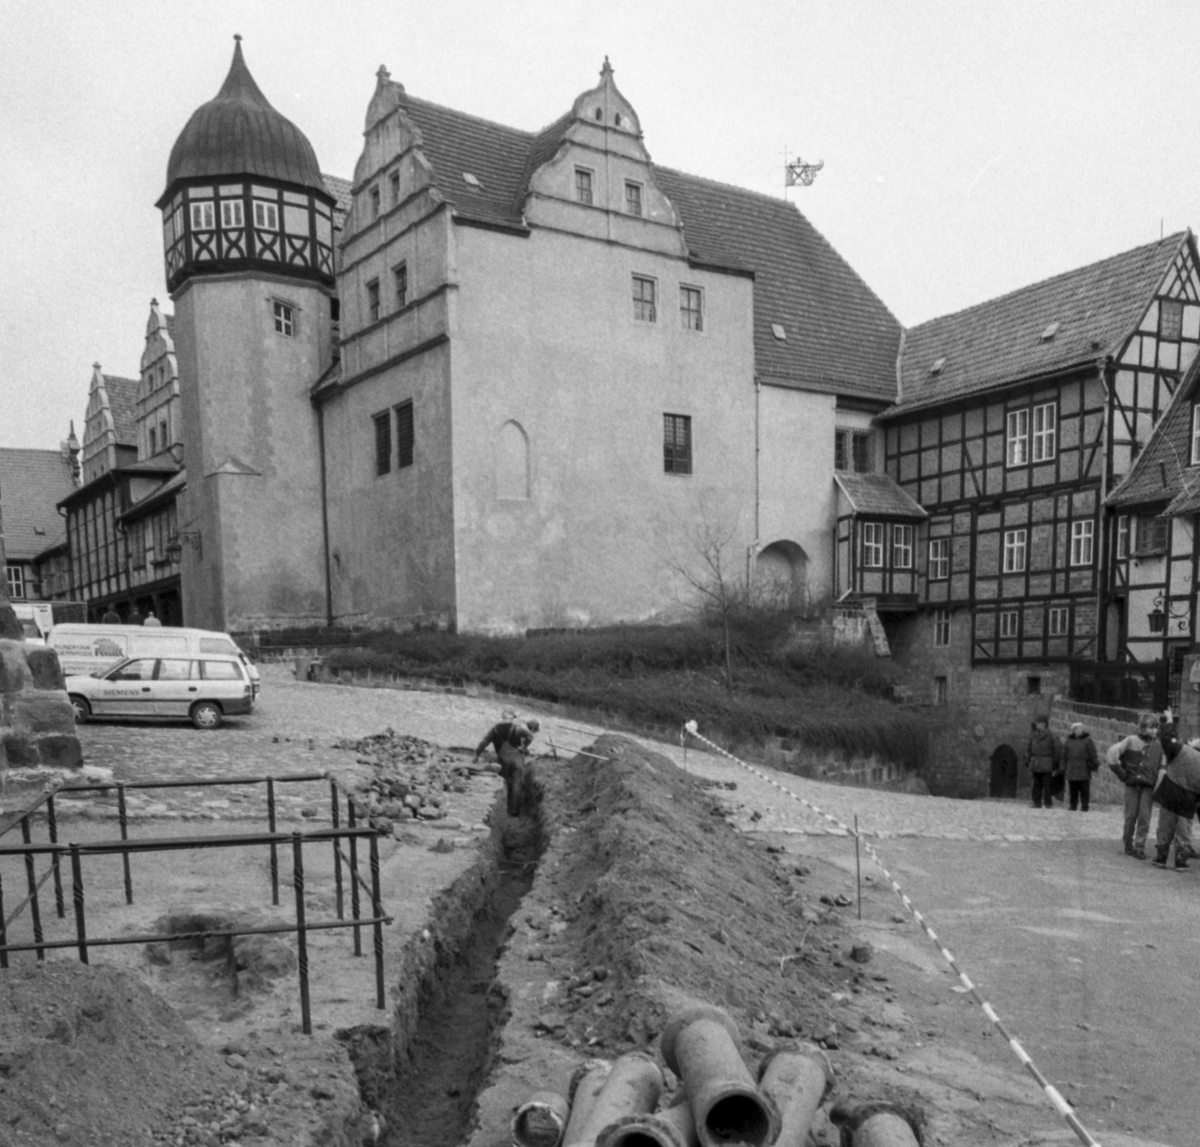 Die  offene Grablege vor dem Kryptaausgang, Foto Jürgen Meusel, 1995